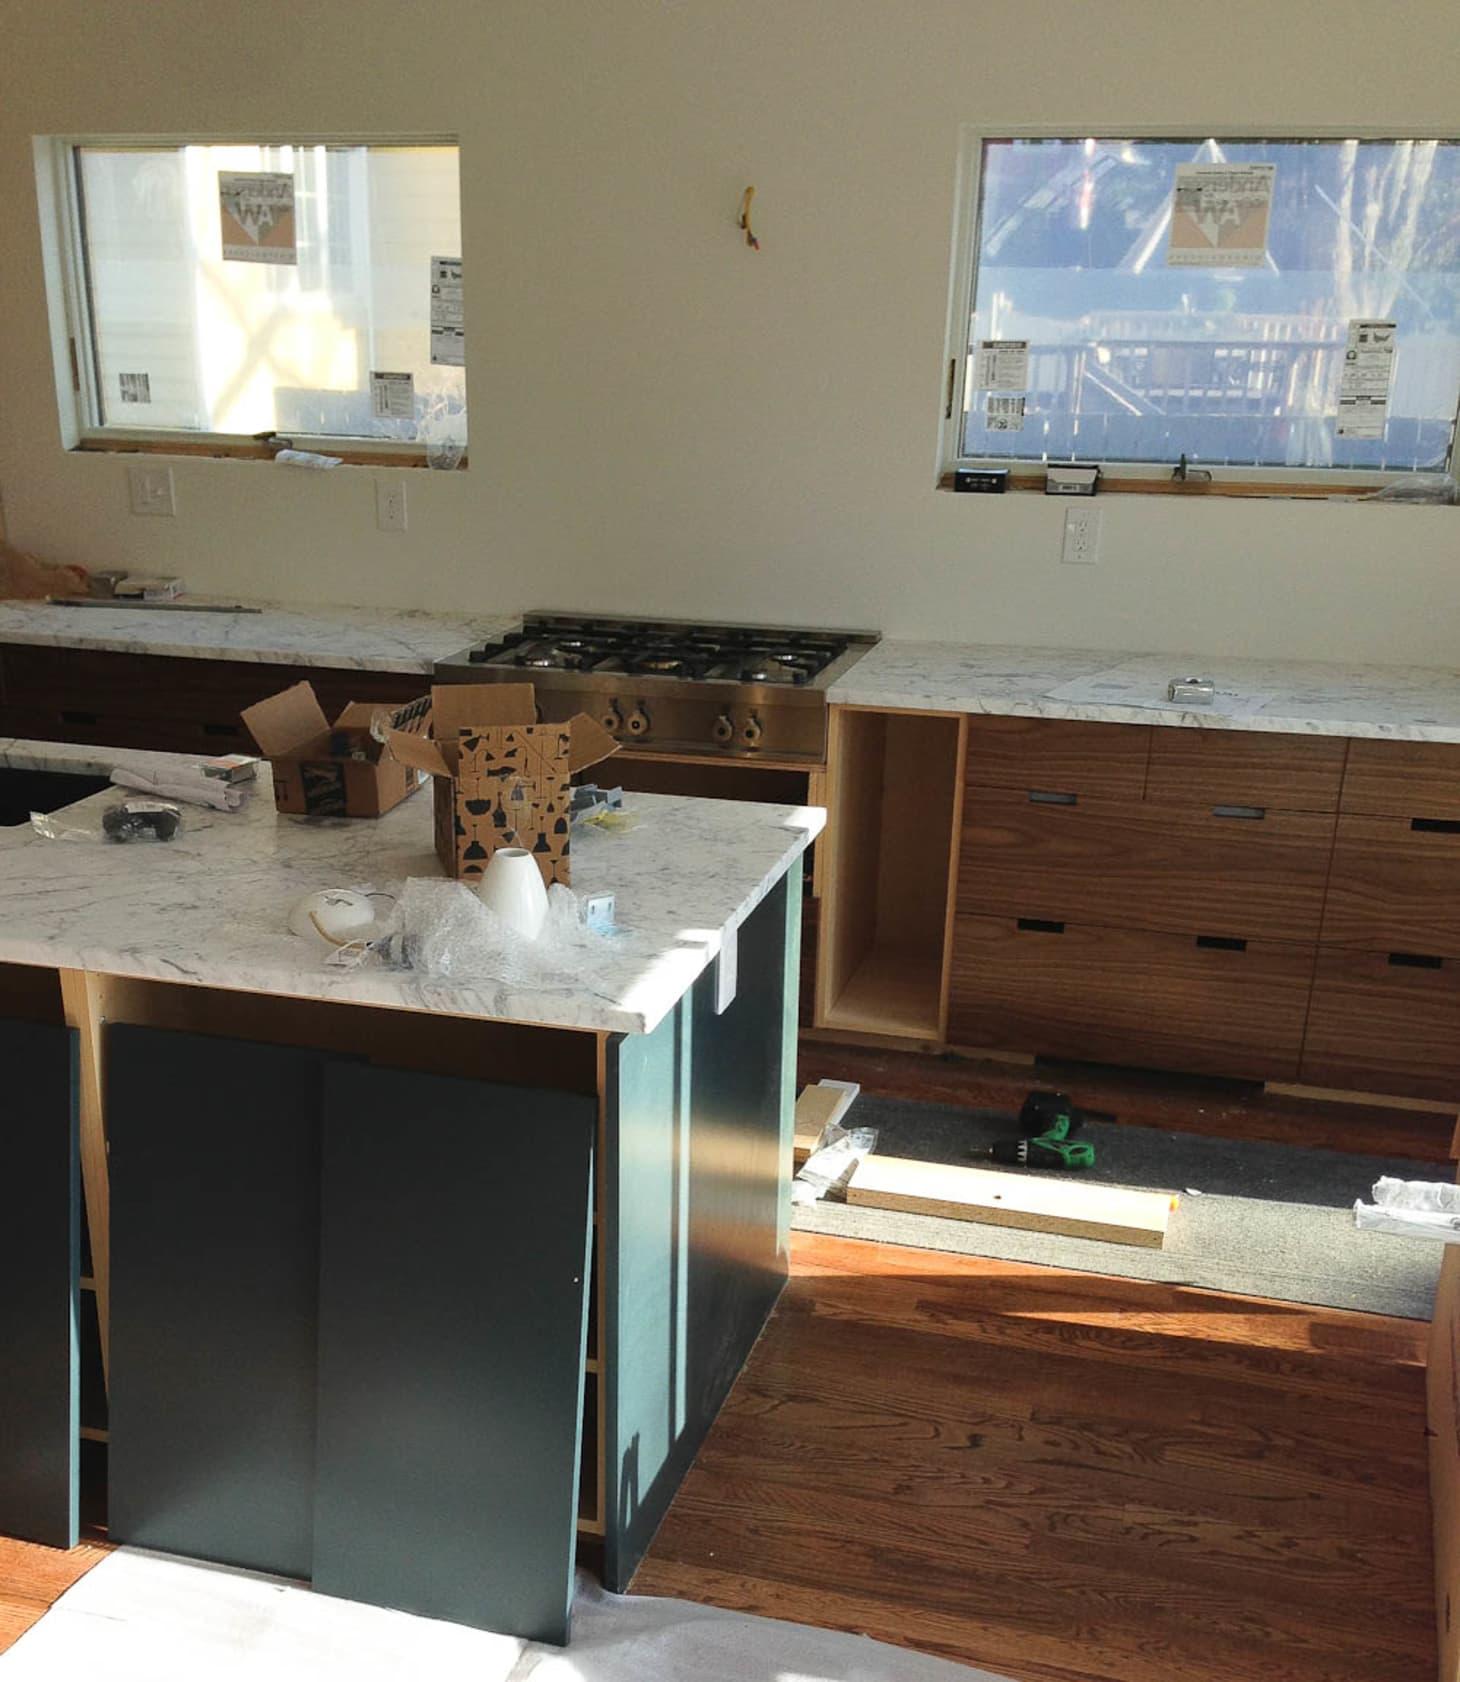 Faith's Kitchen Renovation: How We Finally Got Our Carrara Marble